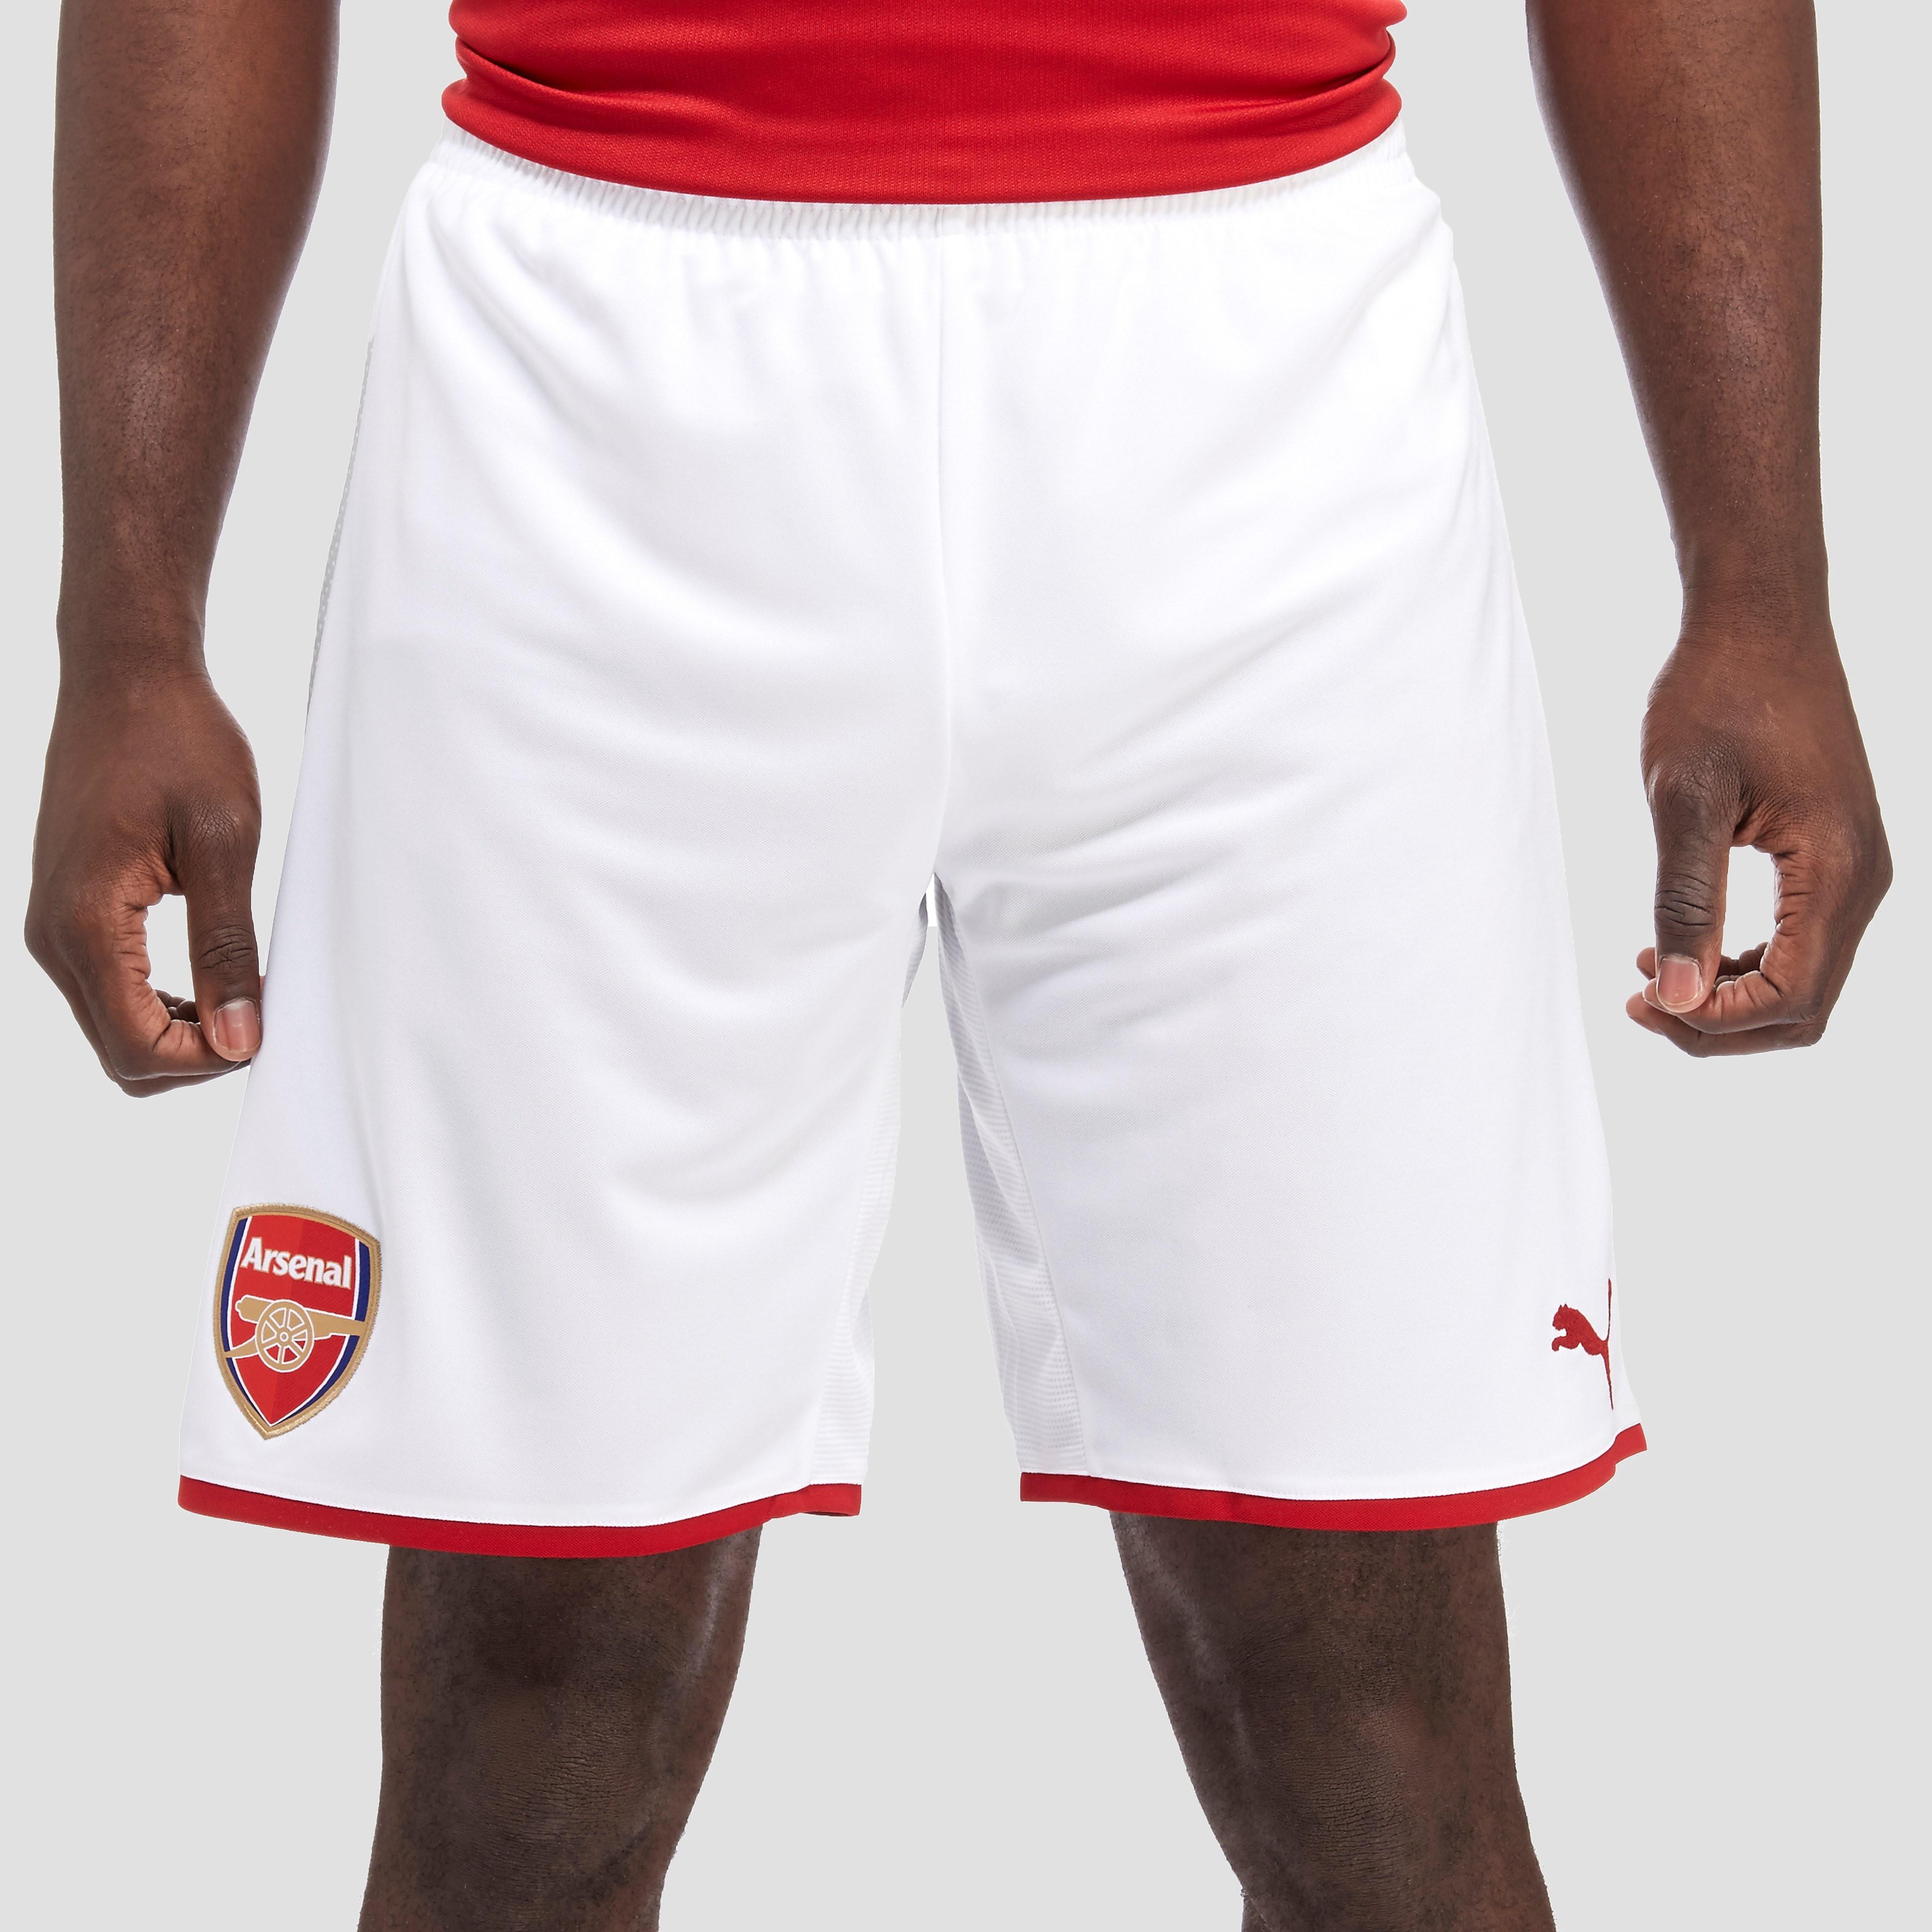 PUMA Arsenal FC 2017/18 Home Shorts